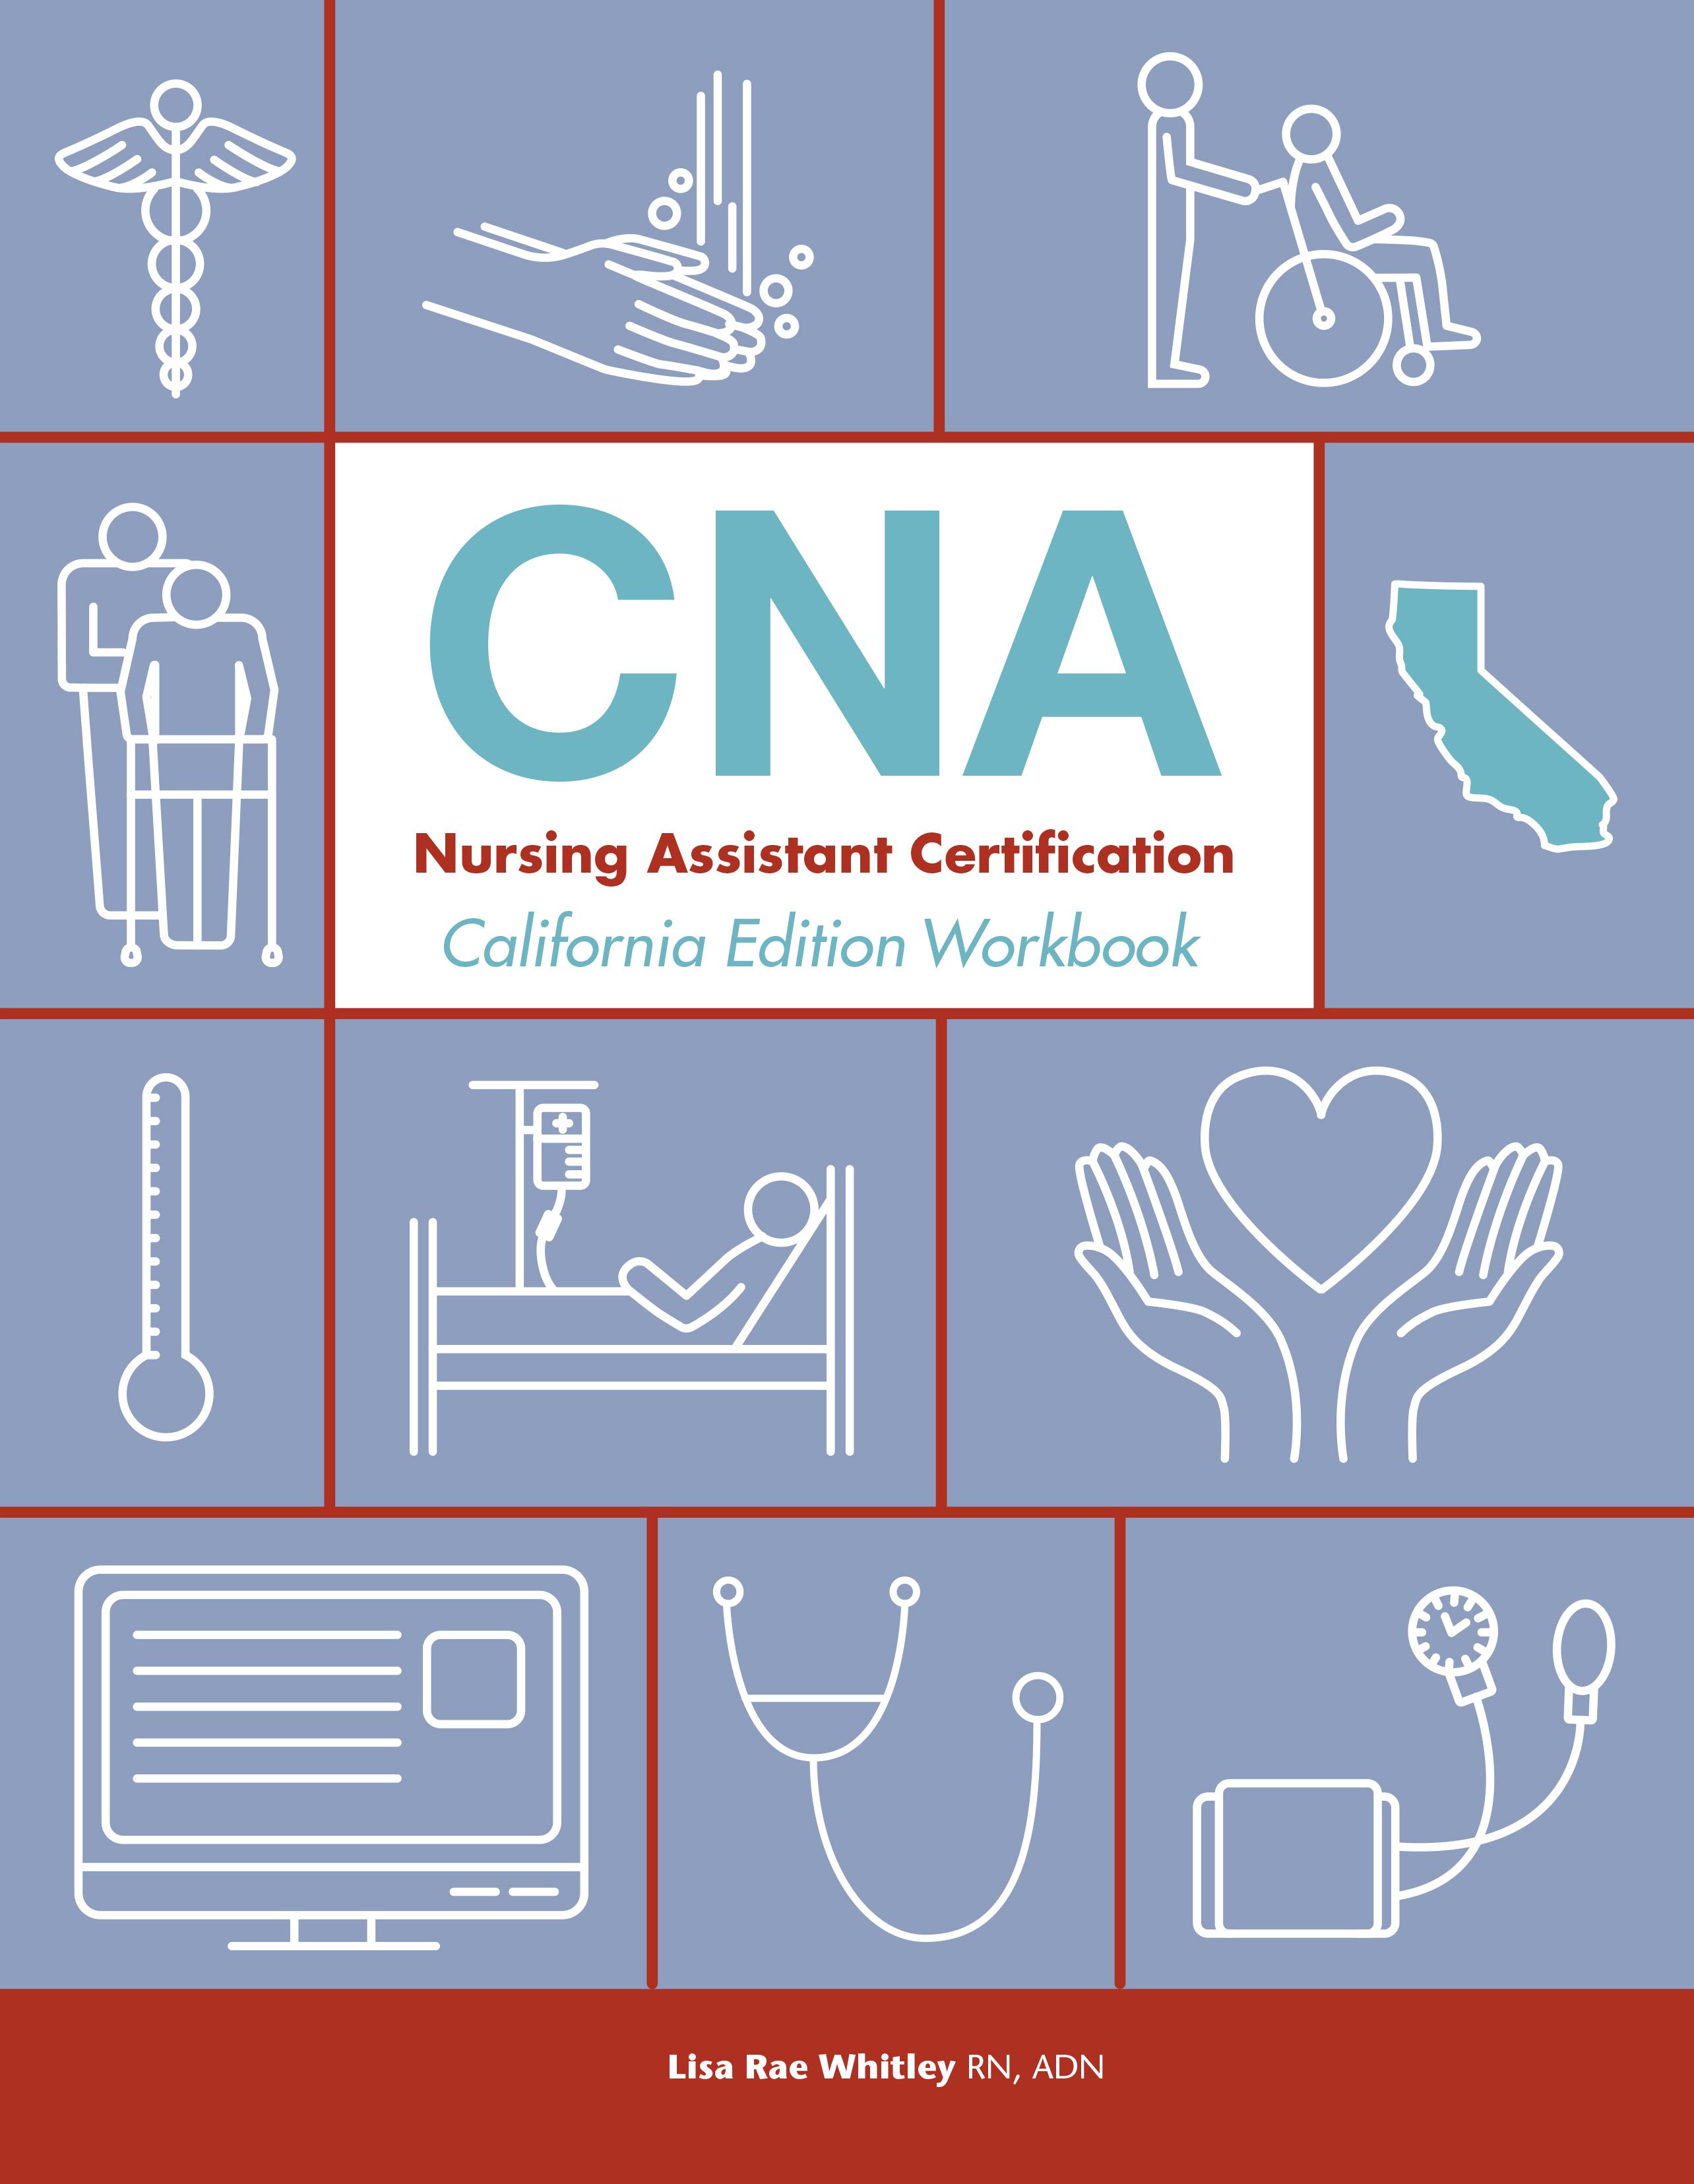 CNA Nursing Assistant Certification, California Edition Workbook